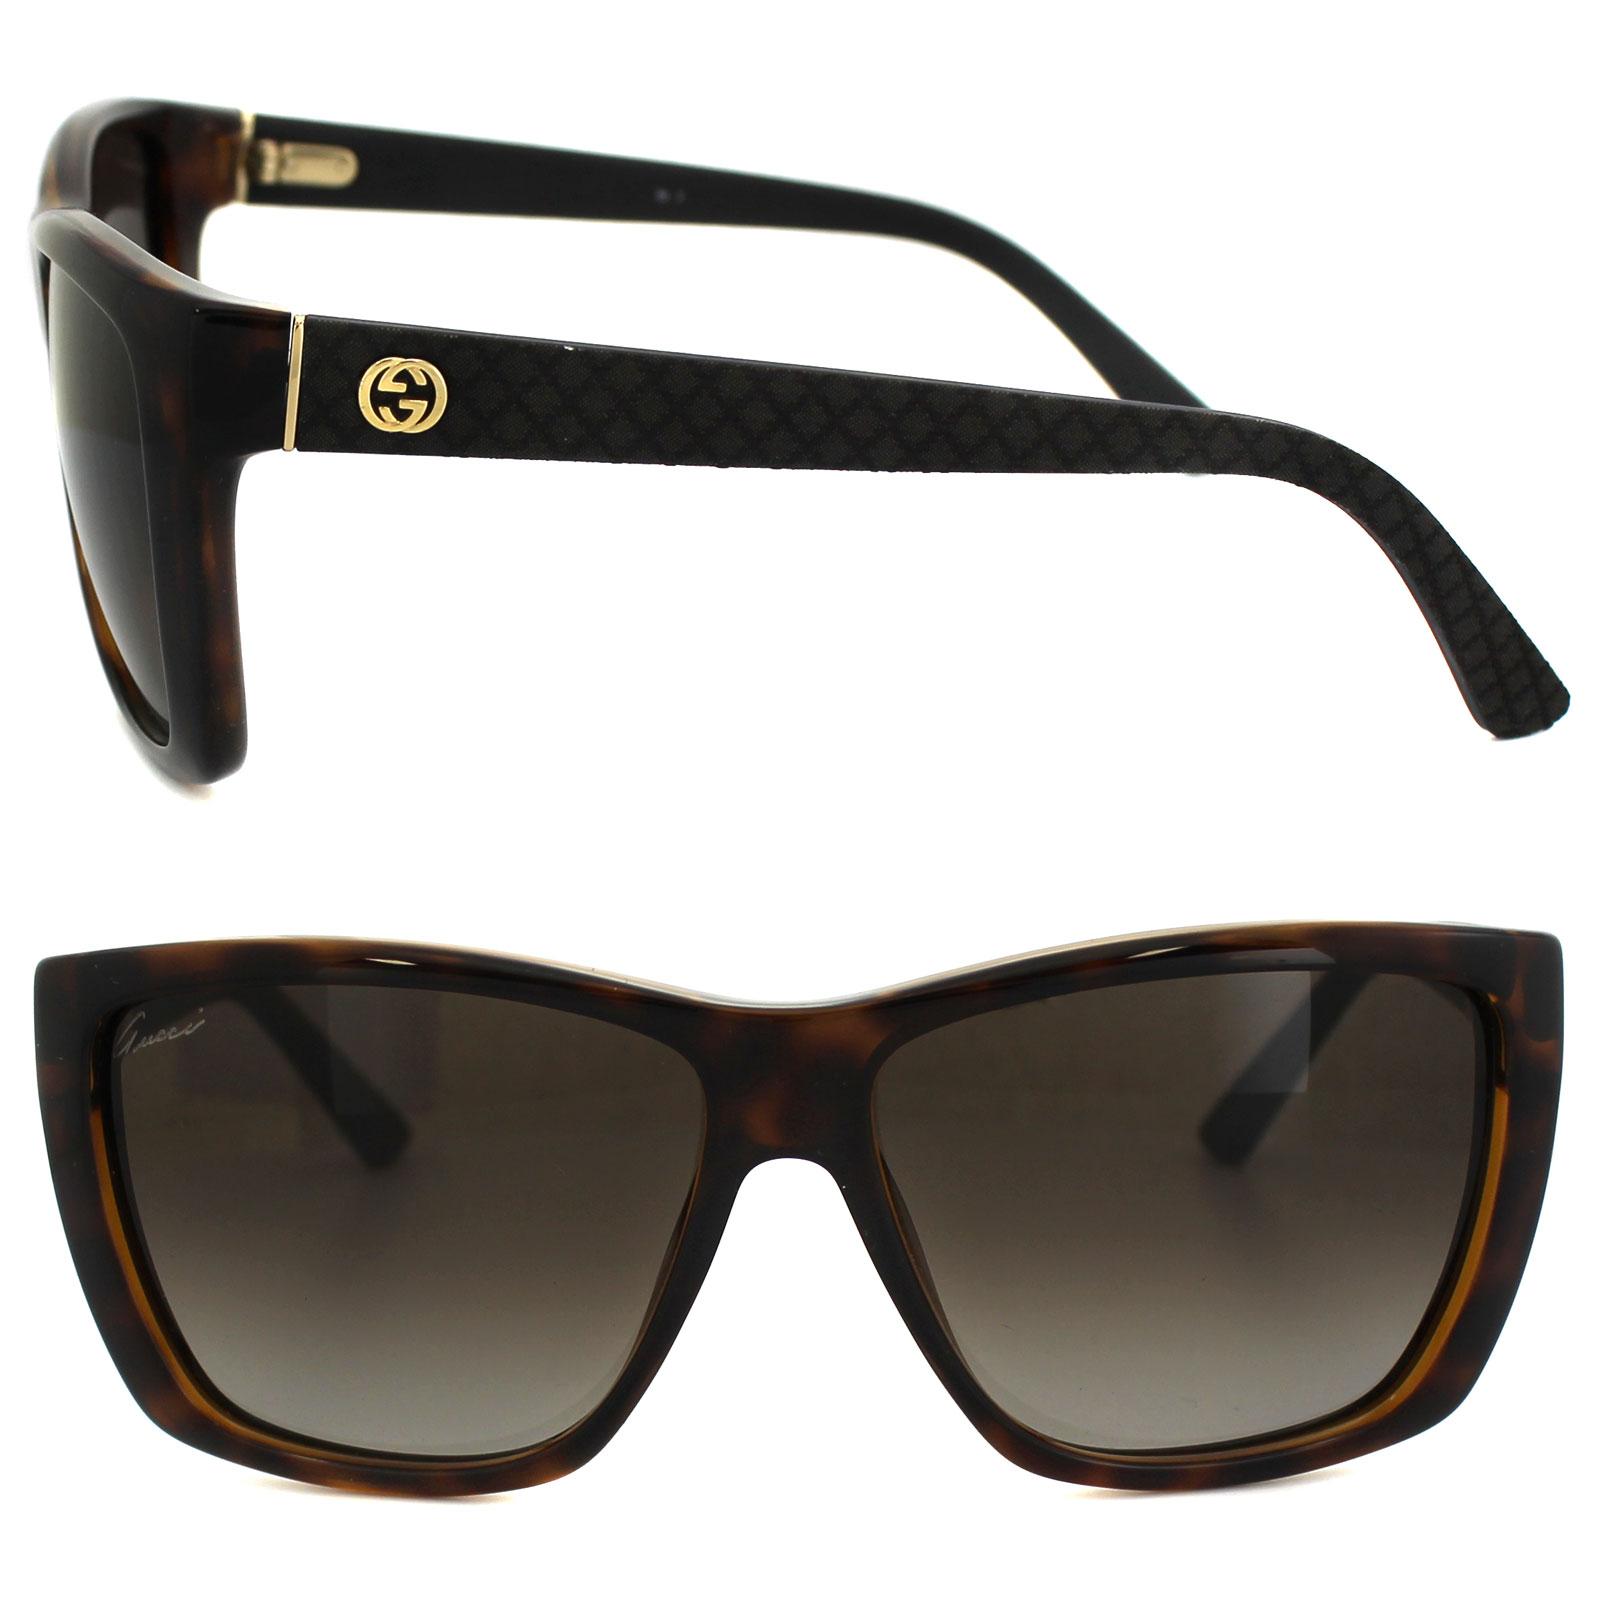 gucci goggles. gucci 3716 sunglasses thumbnail 1 2 goggles a